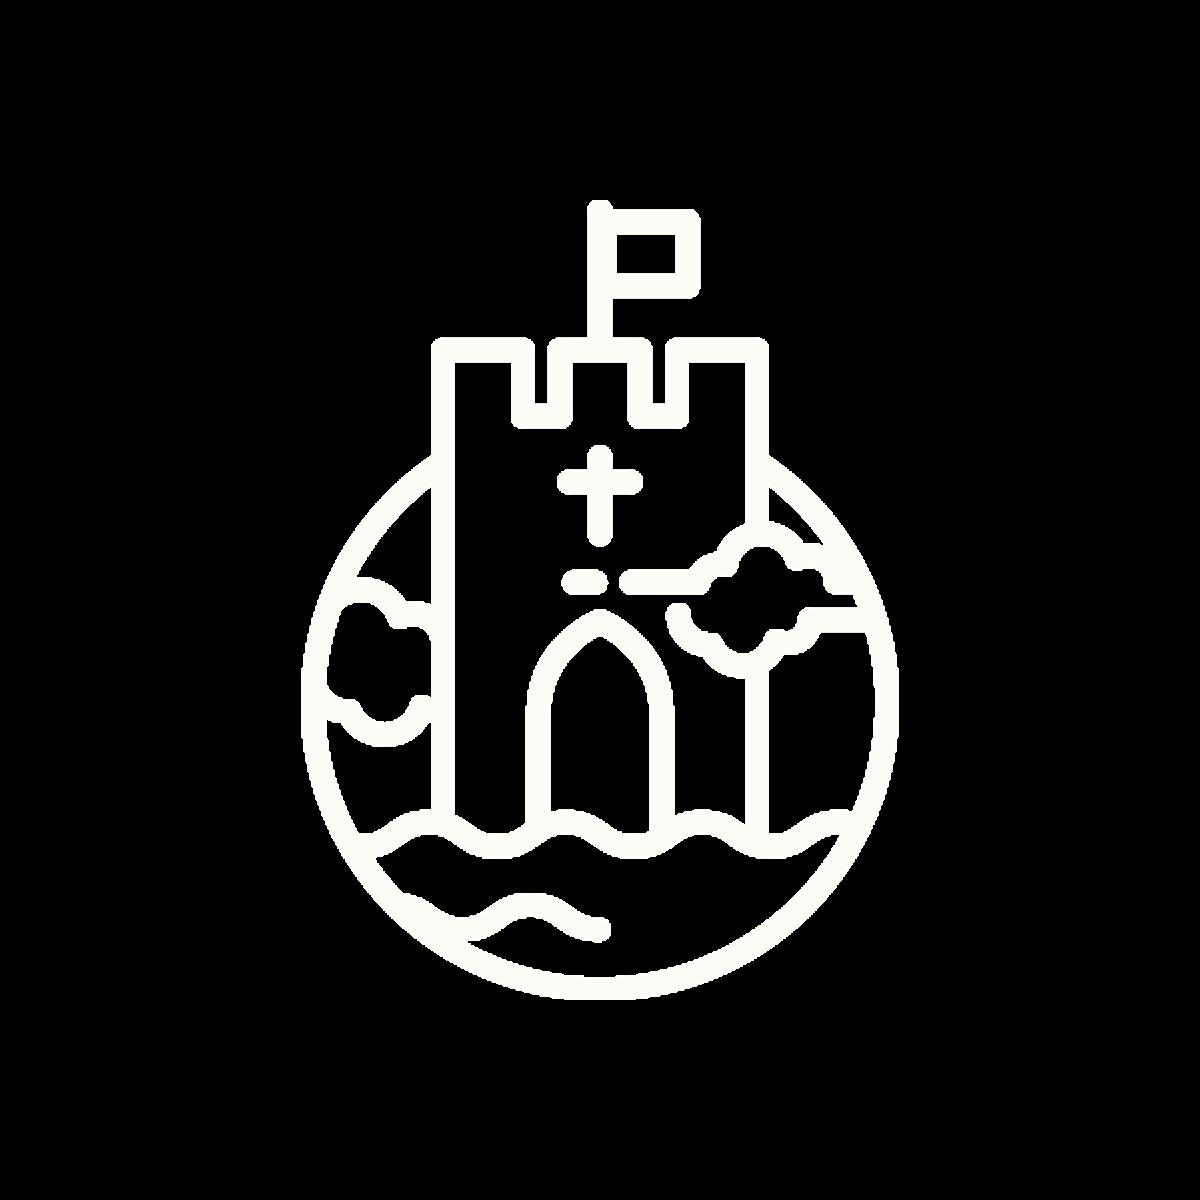 Scc-bargate-icon.png